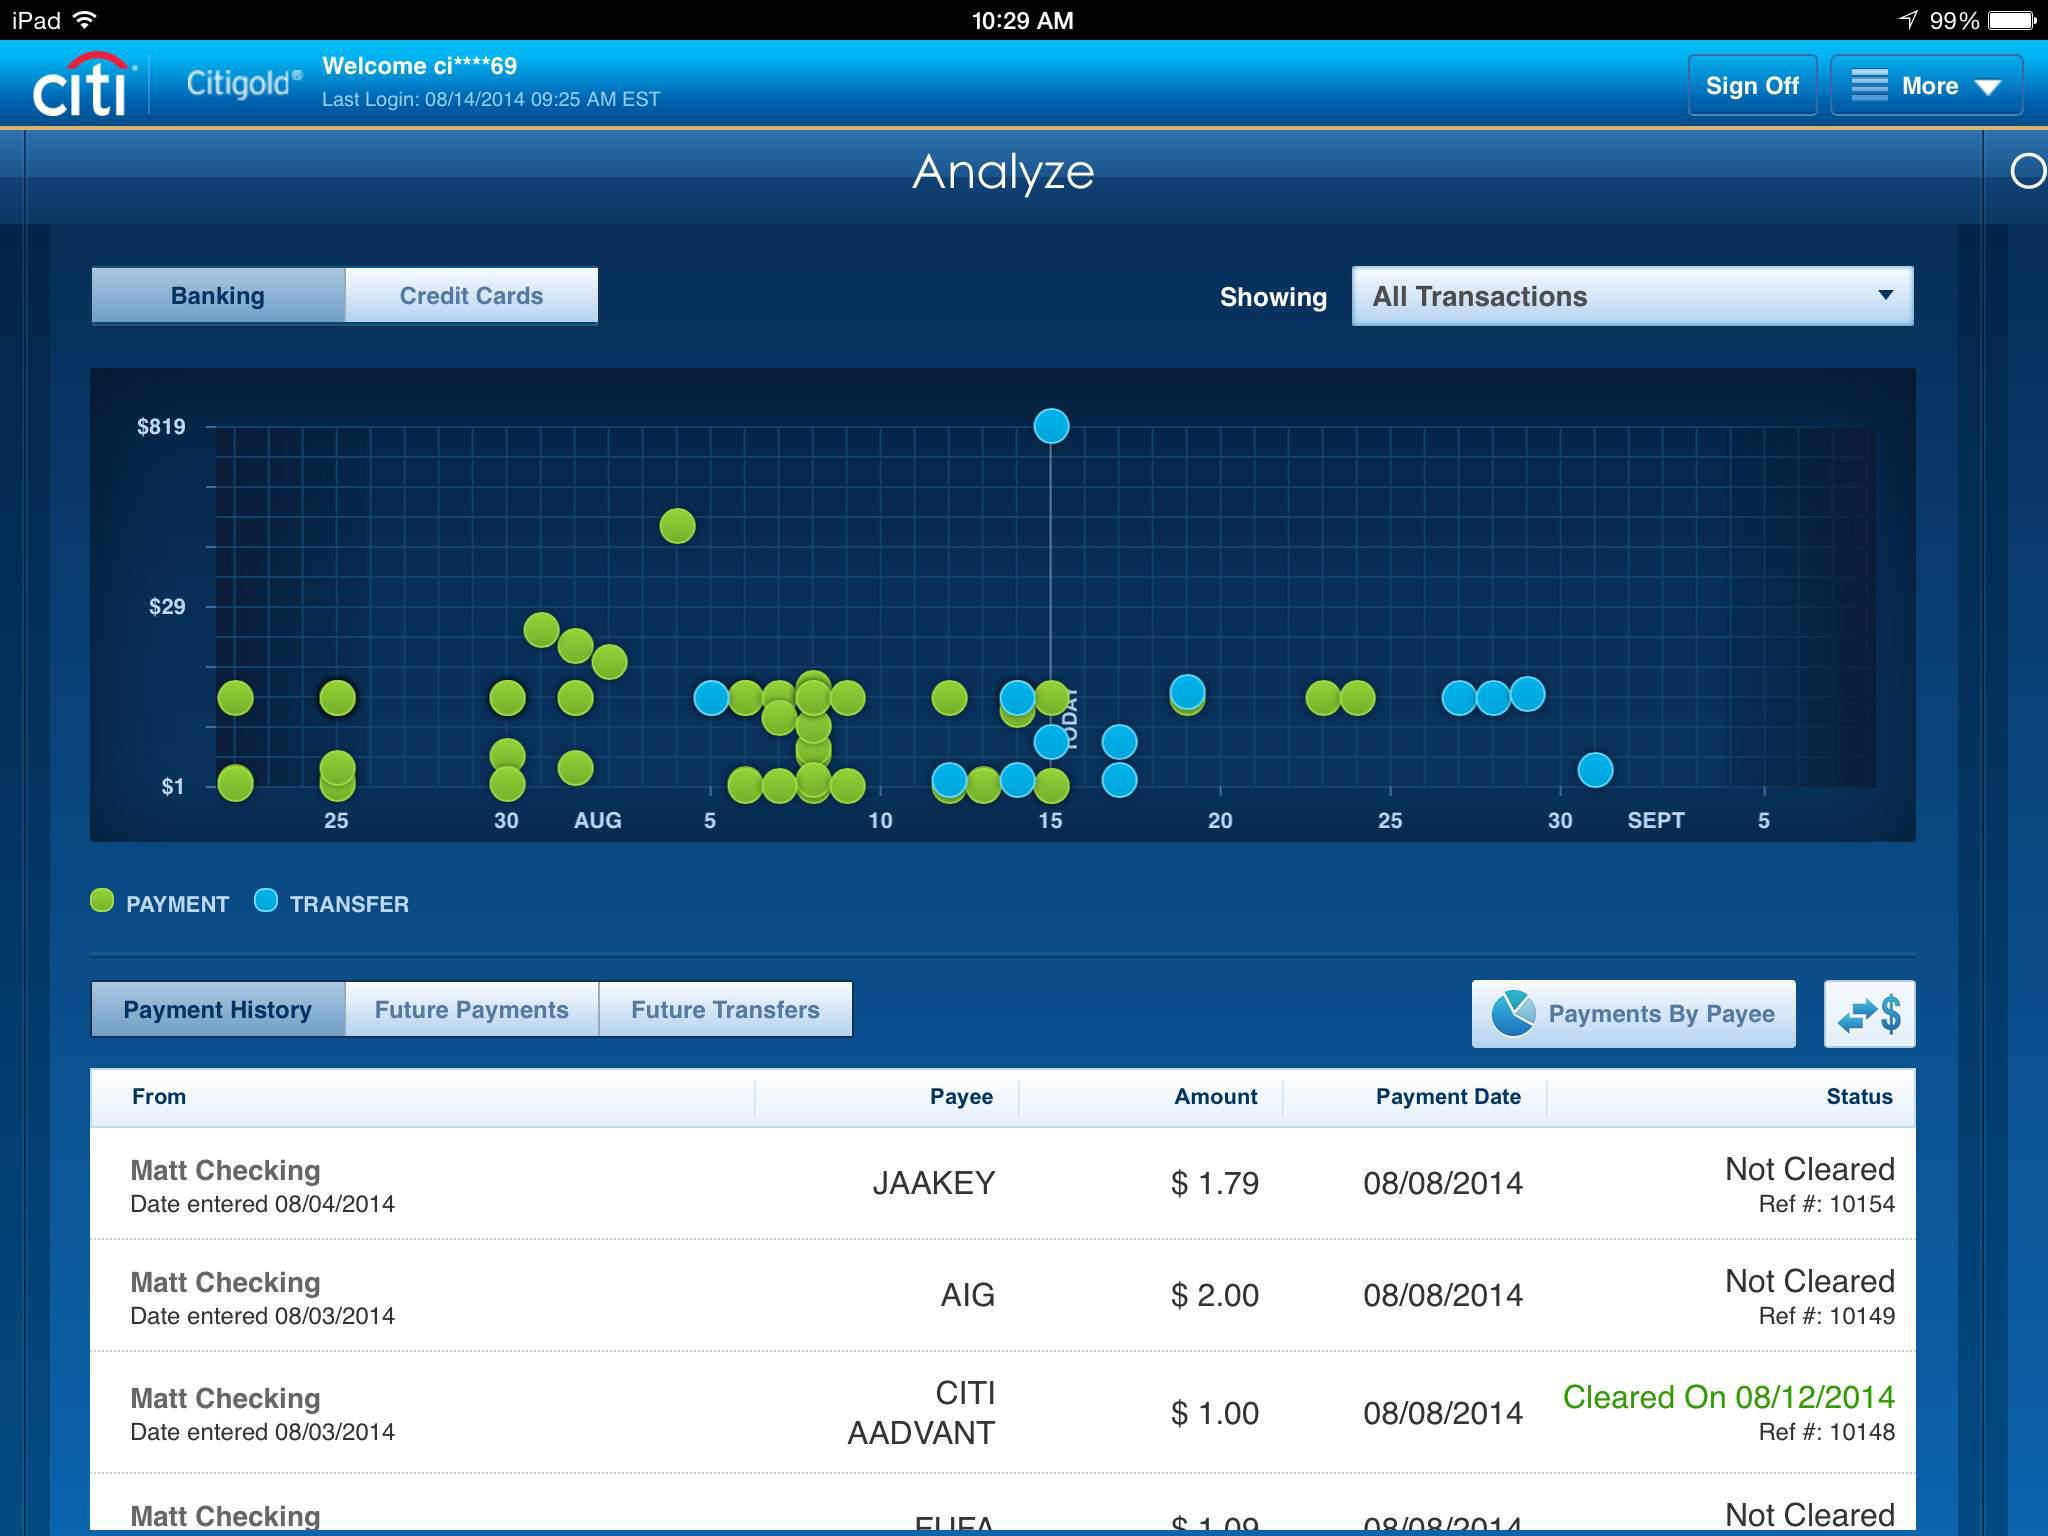 Citibank for iPad®